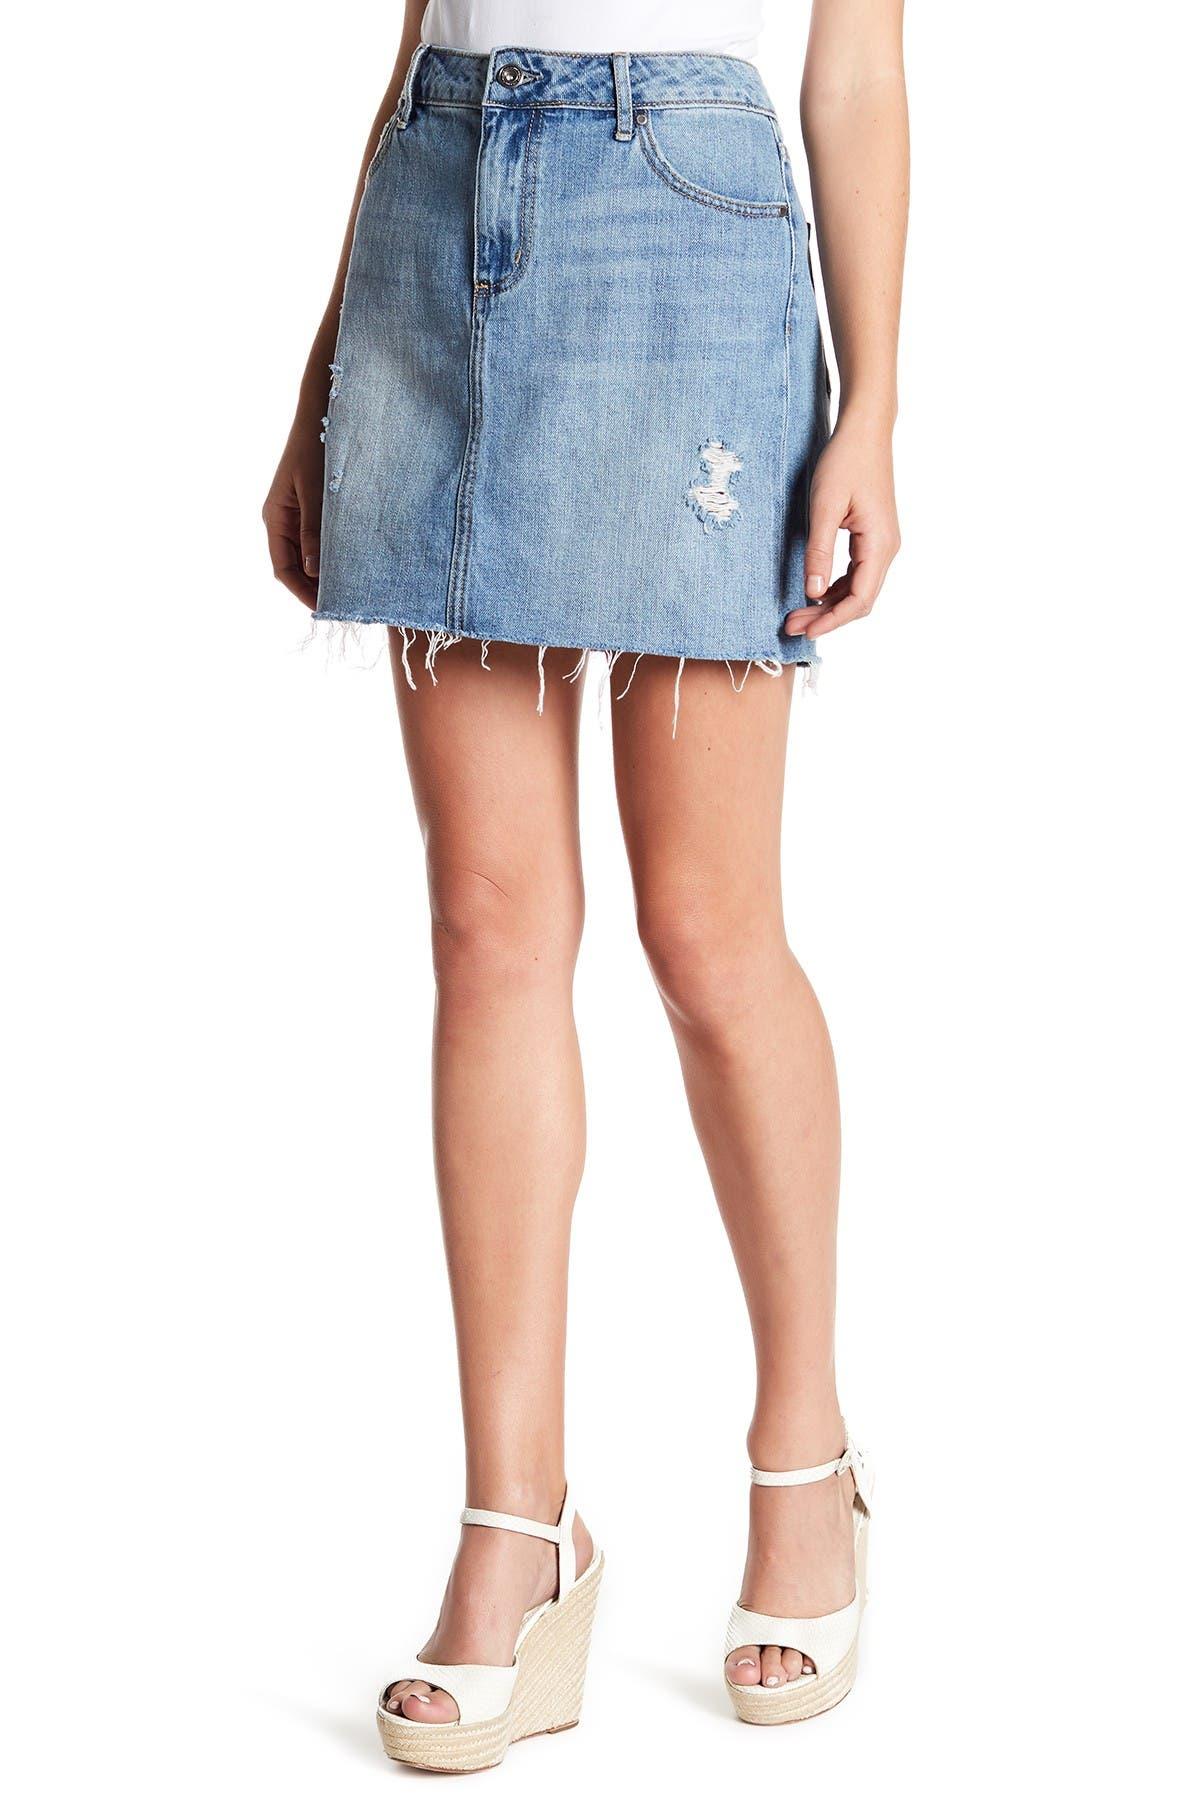 Image of Melrose and Market Cutoff Denim Mini Skirt